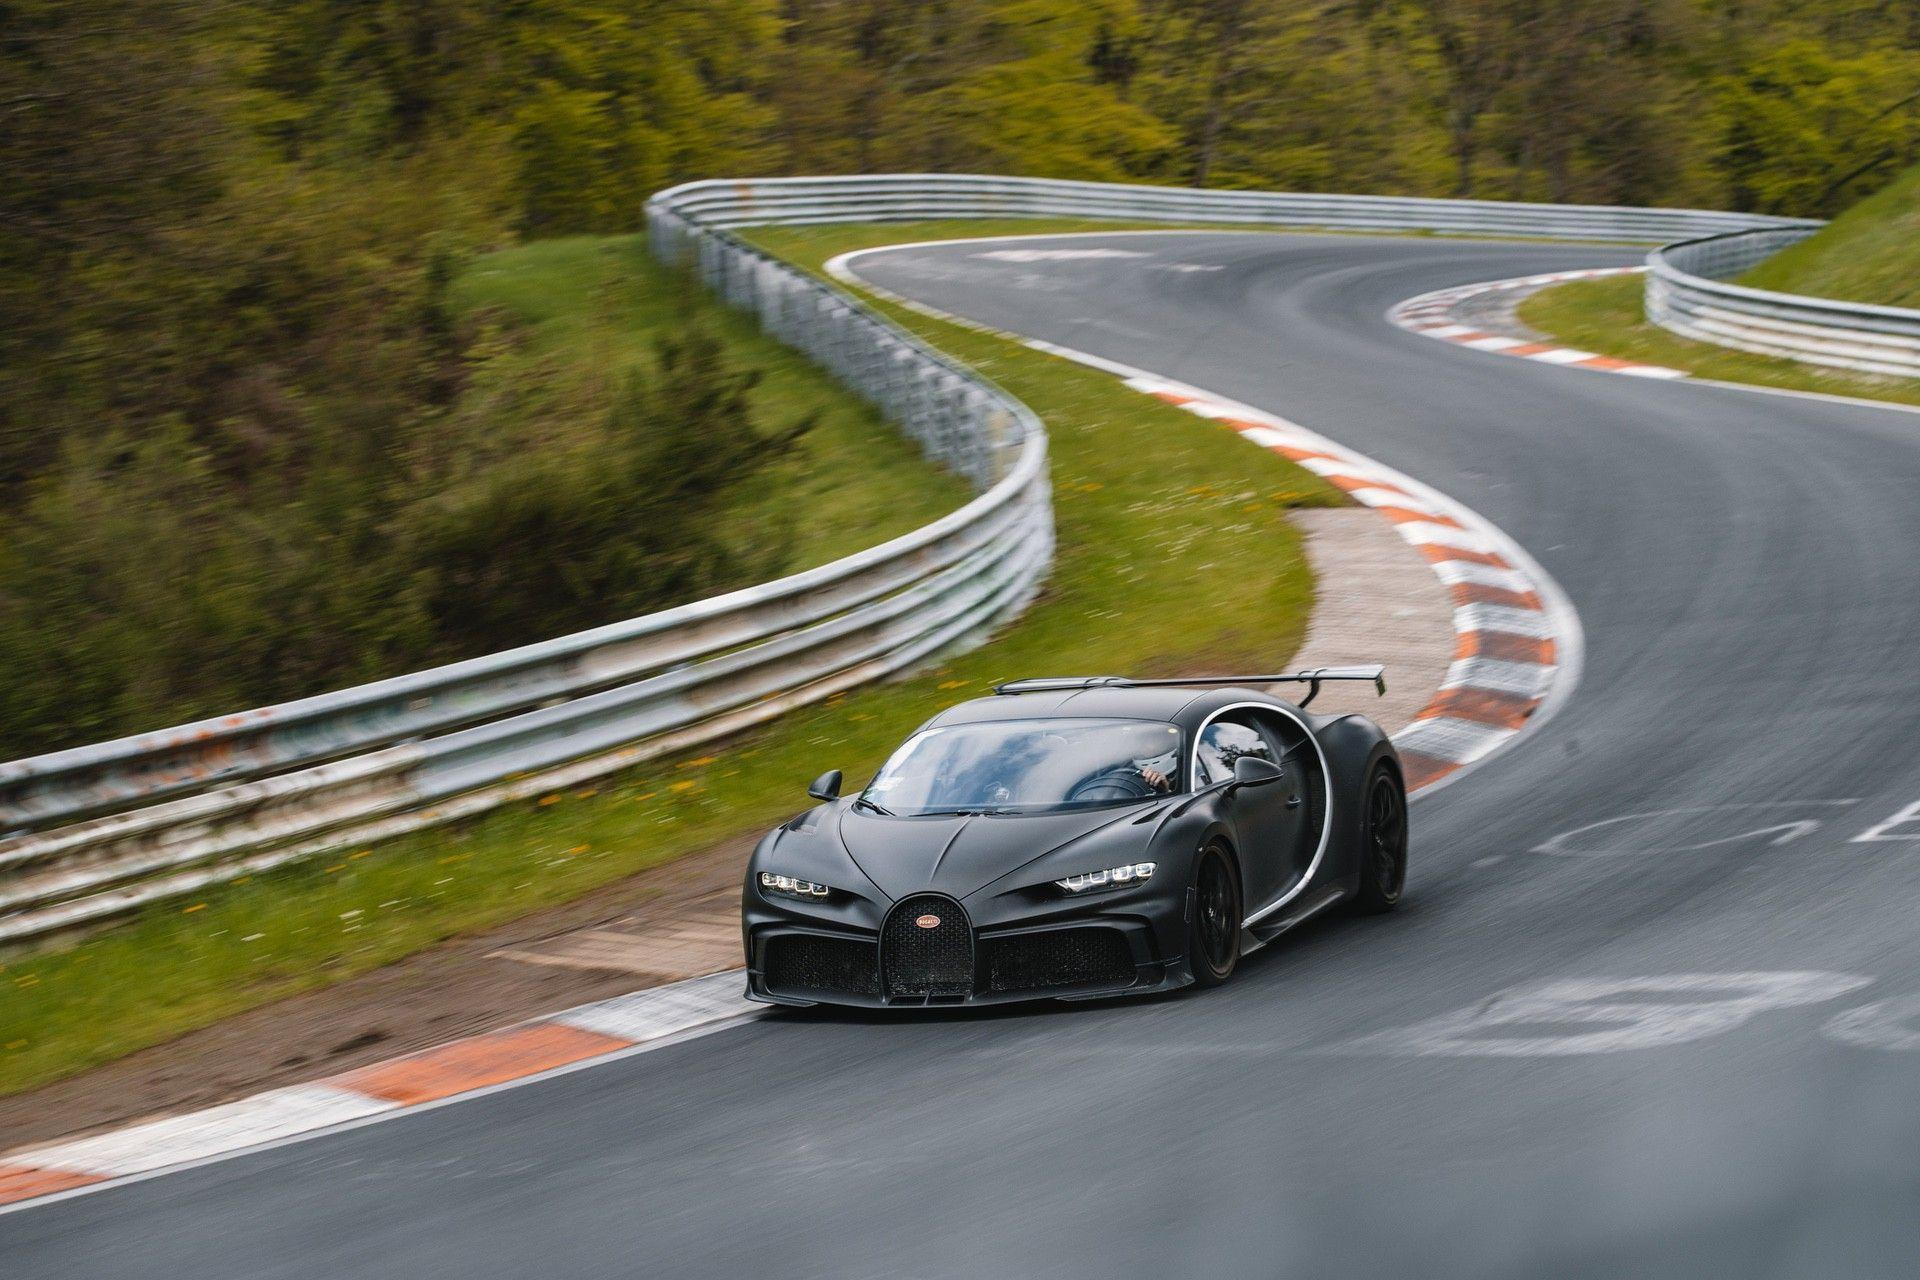 22_bugatti-lineup_nbr_pur-sport